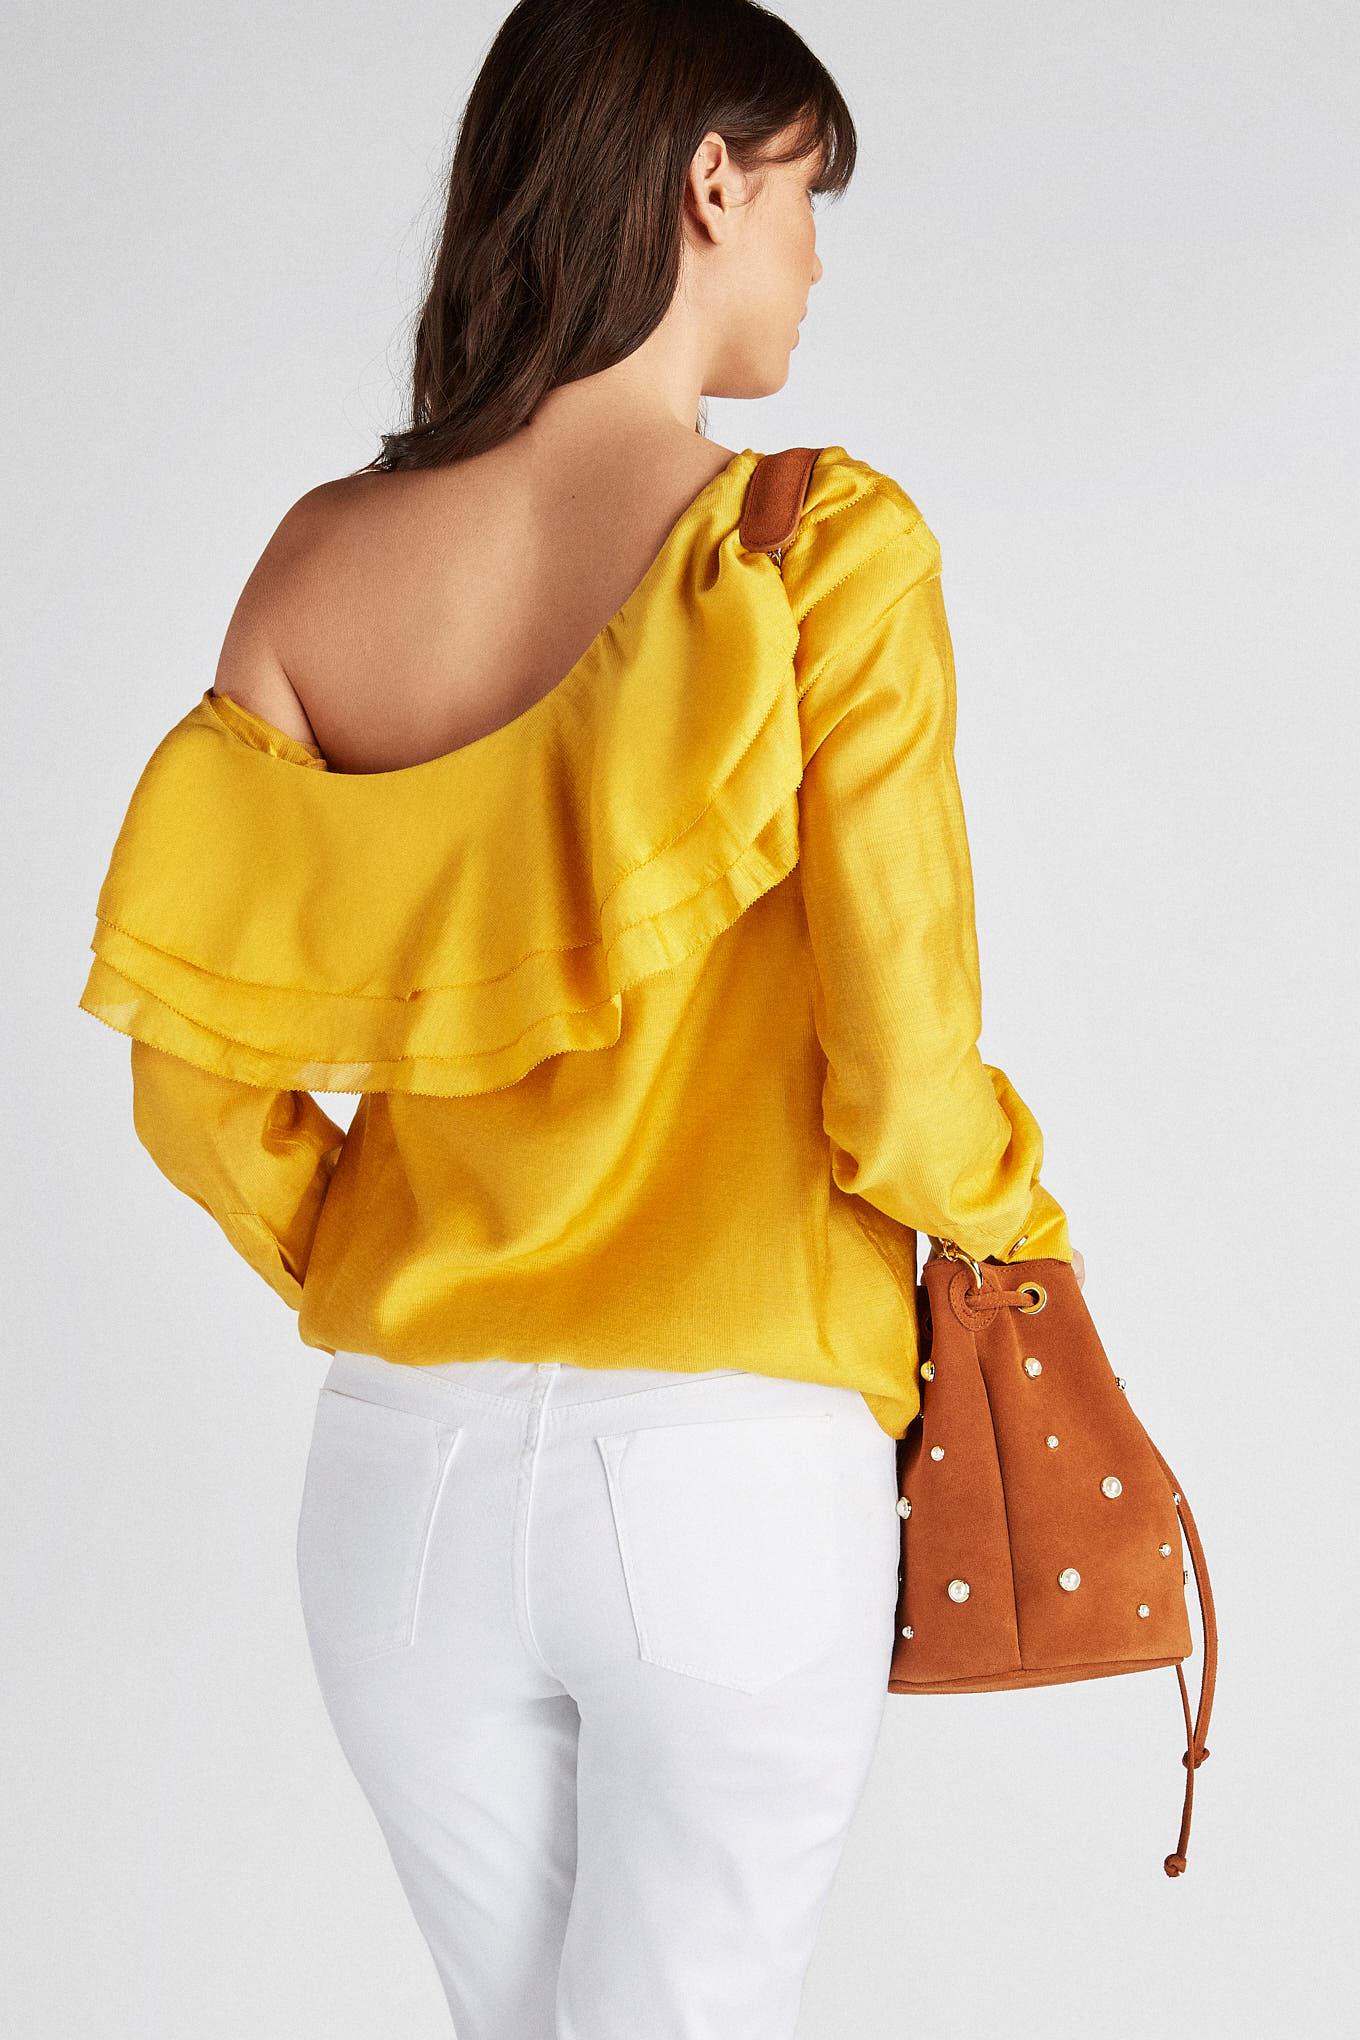 Blusa Amarelo Fantasy Mulher